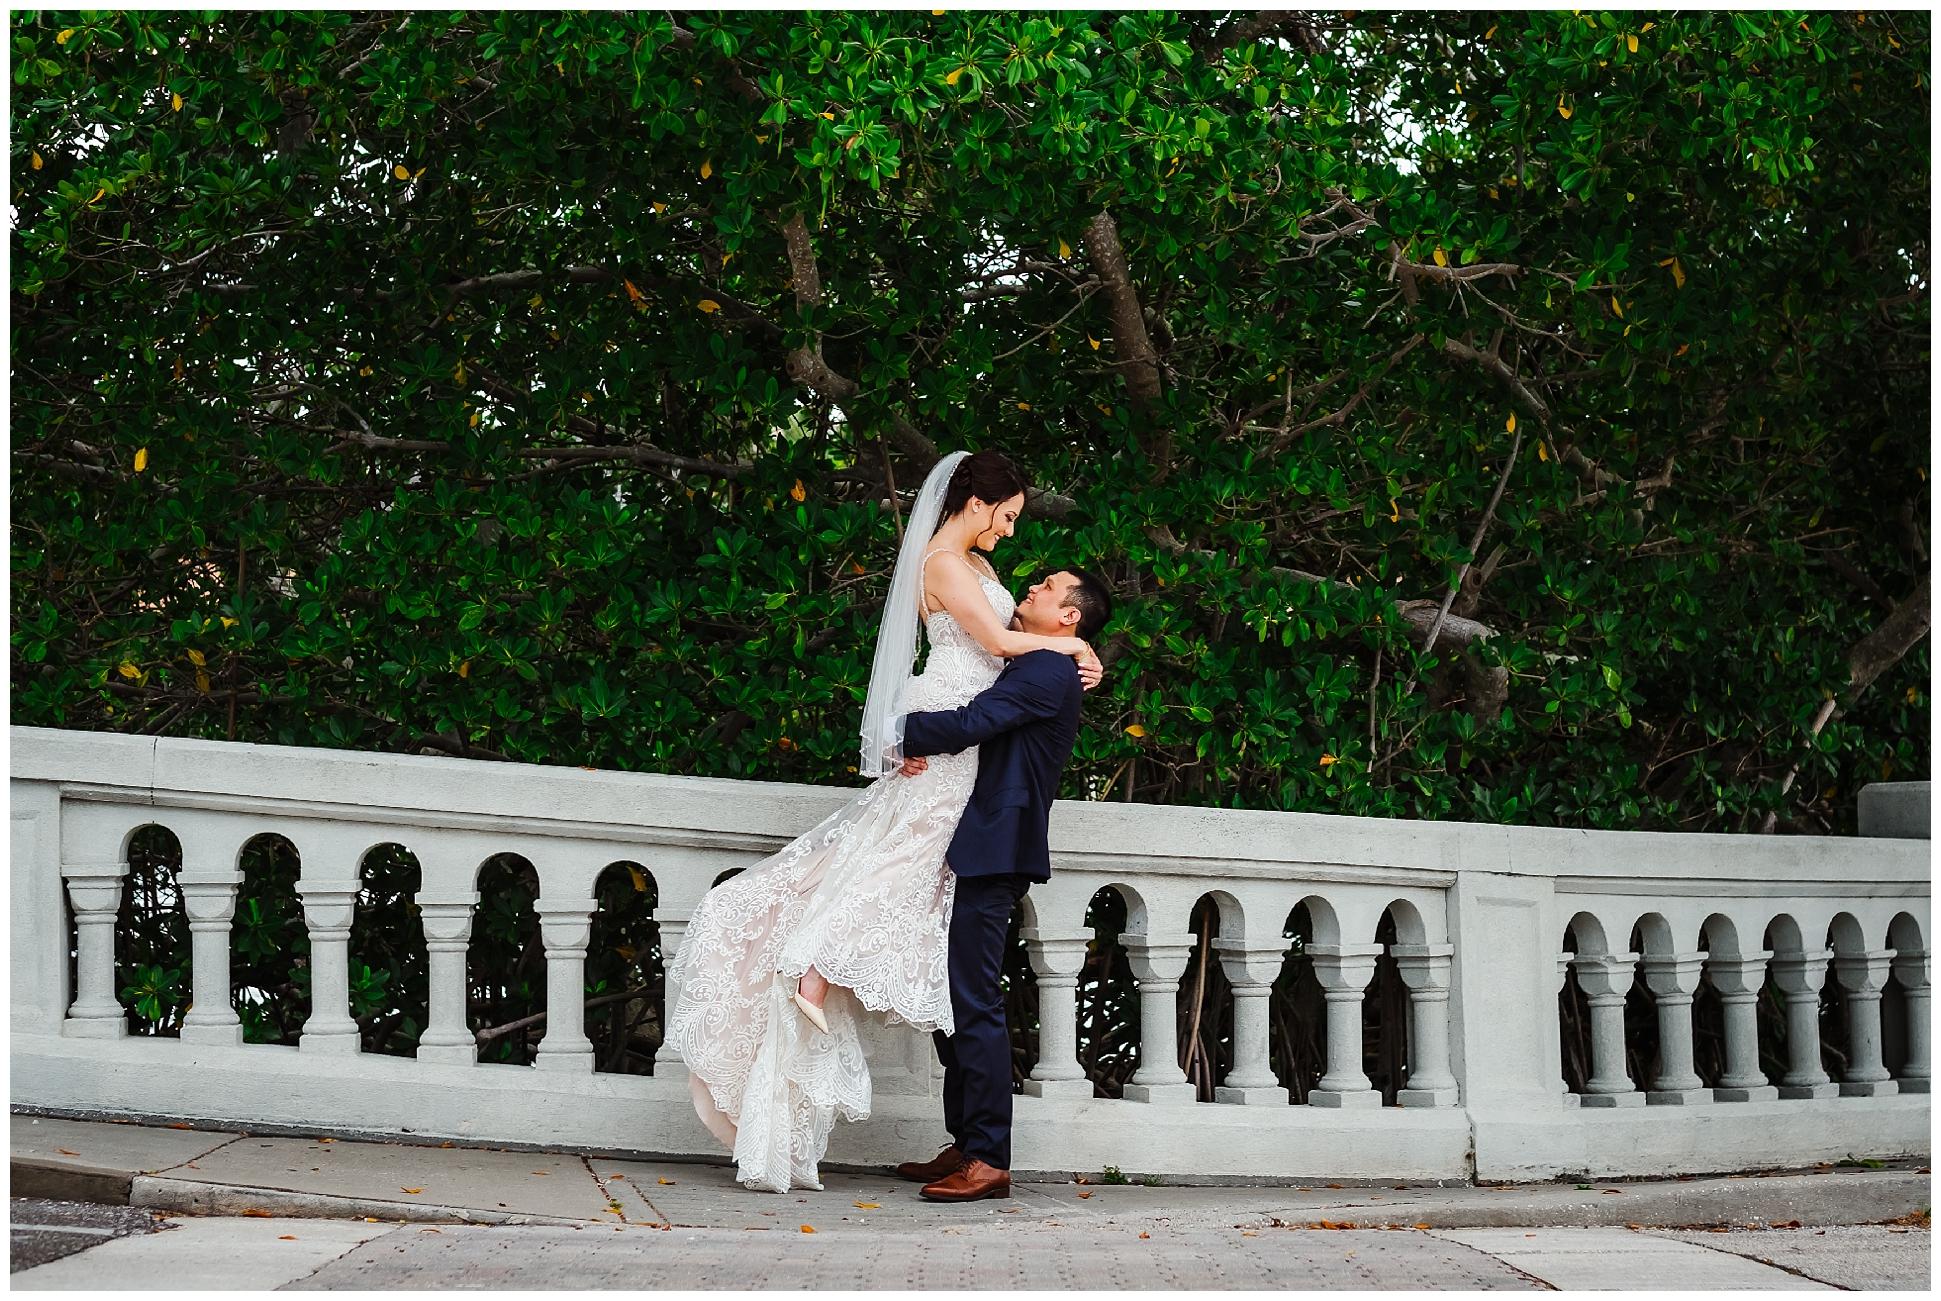 vinoy-sunset-ballroom-rainy-day-wedding-photography-orchids-trinidad-flawless-fetes-ashlee-hamon_0139.jpg